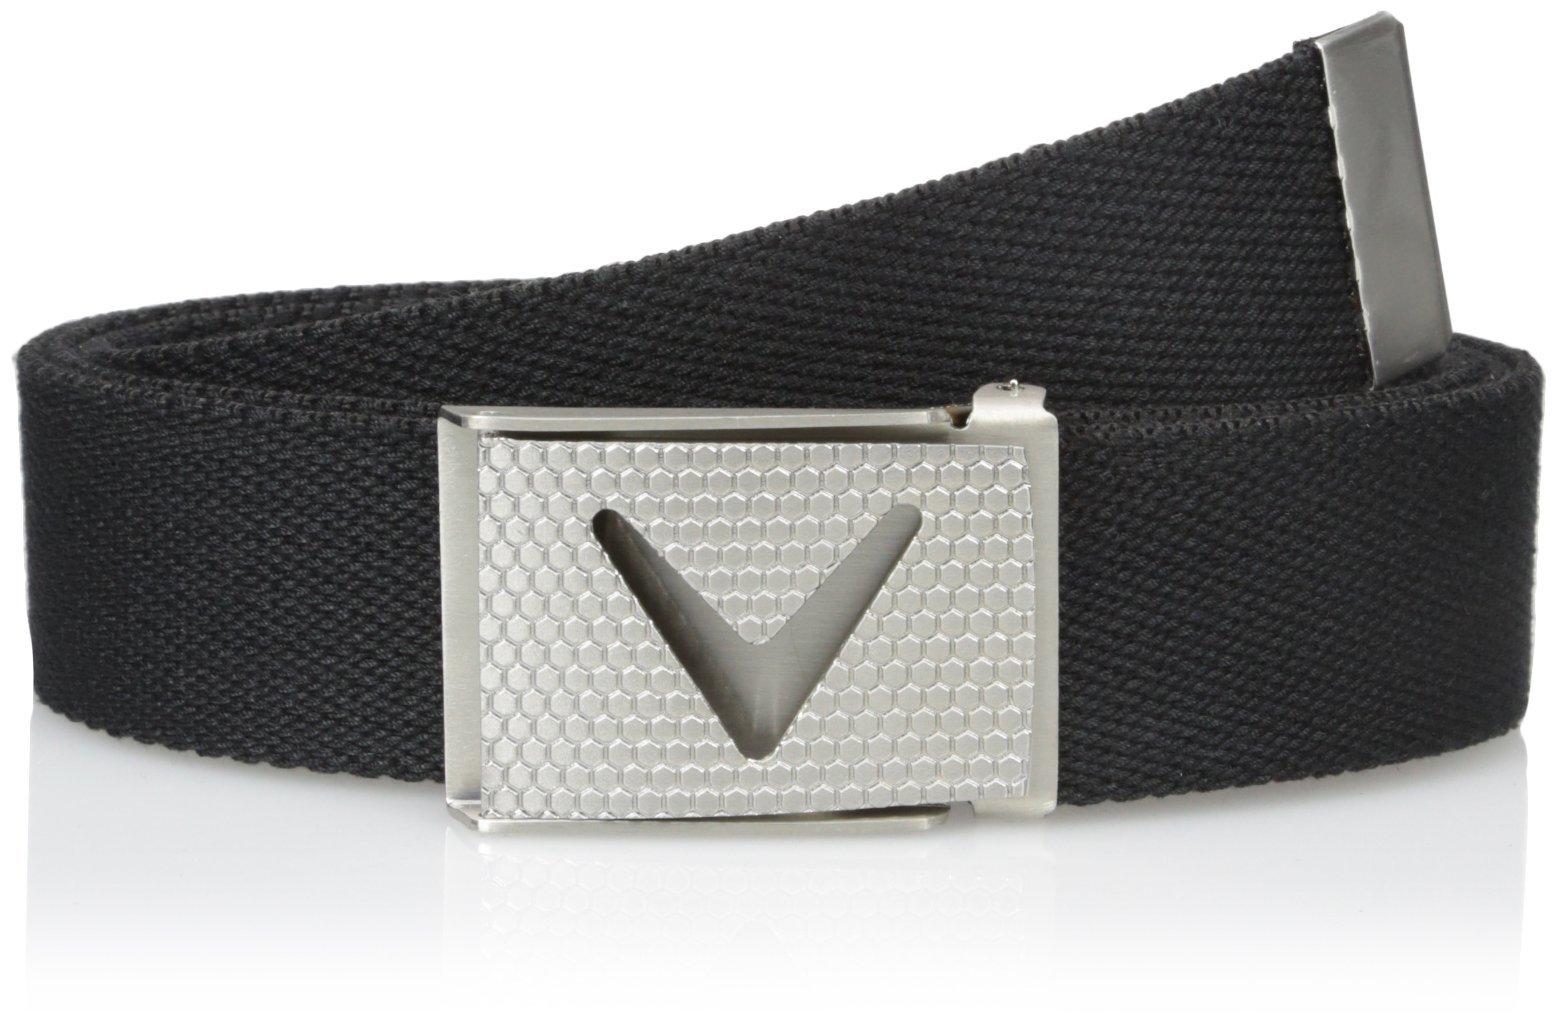 Callaway Men's Golf Cut To Fit Solid Webbed Belt, Black (002), One Size